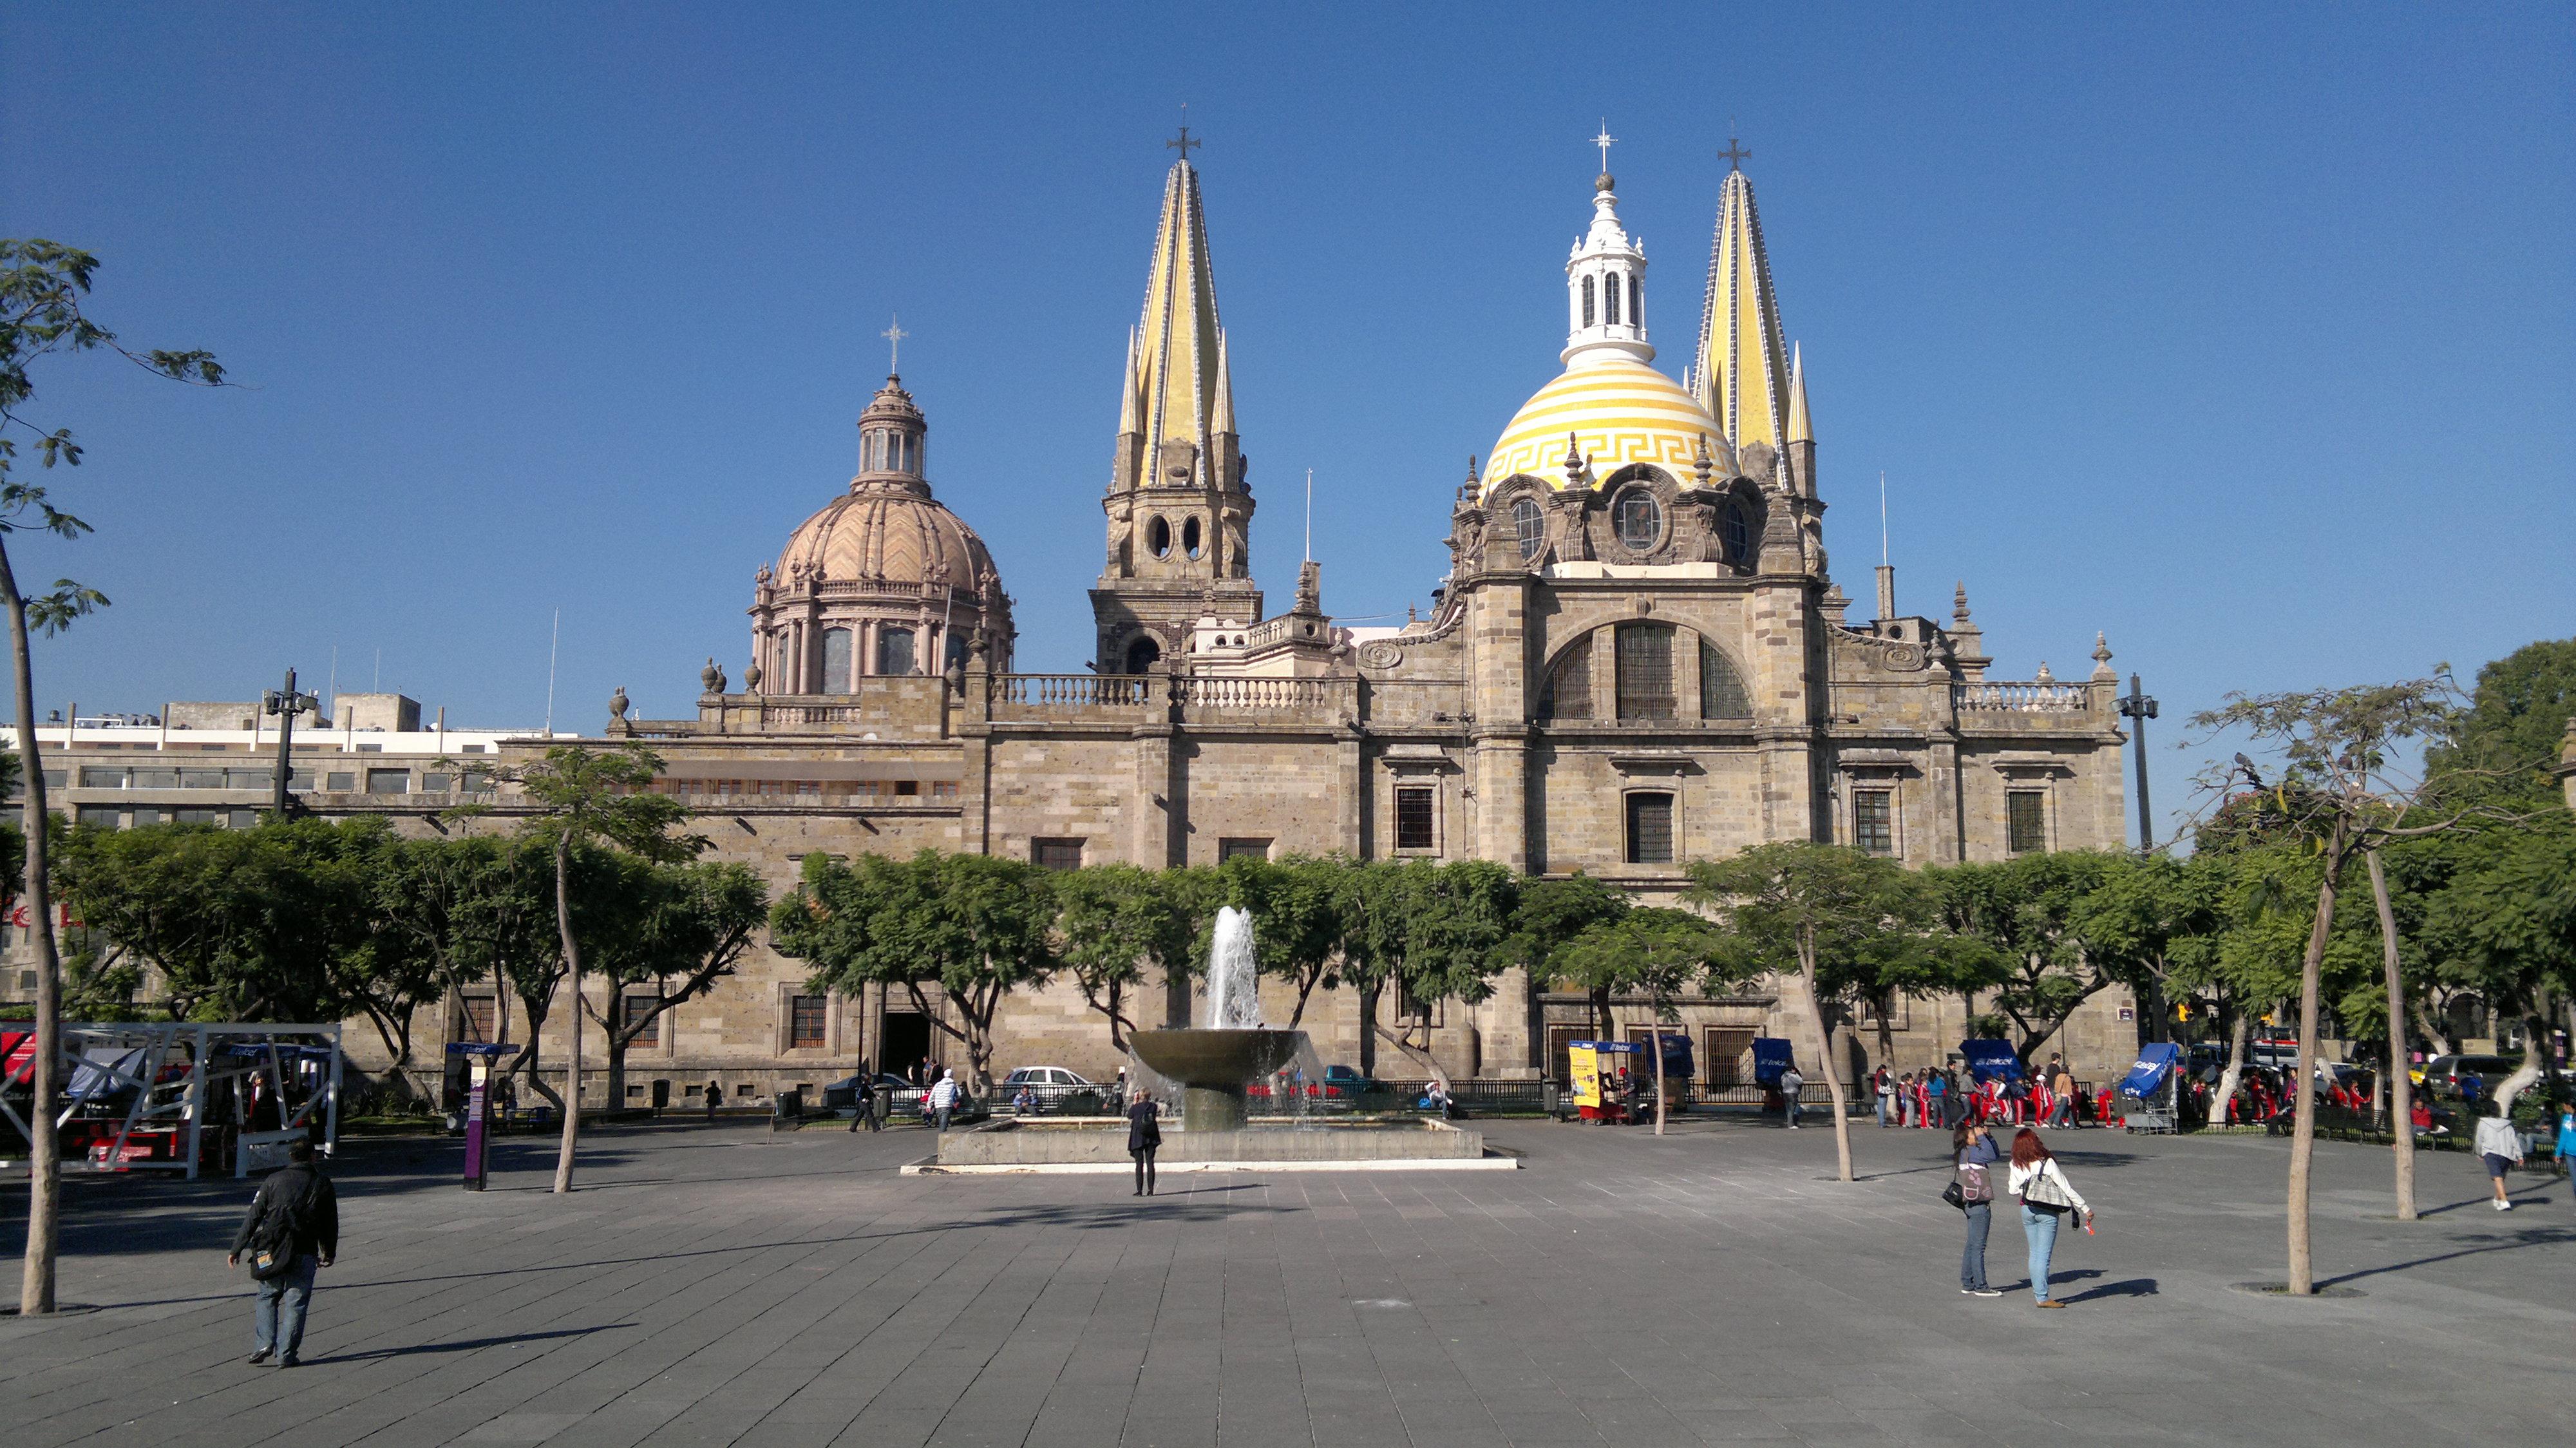 File:Vista posterior de la Catedral de Guadalajara.jpg - Wikimedia ...